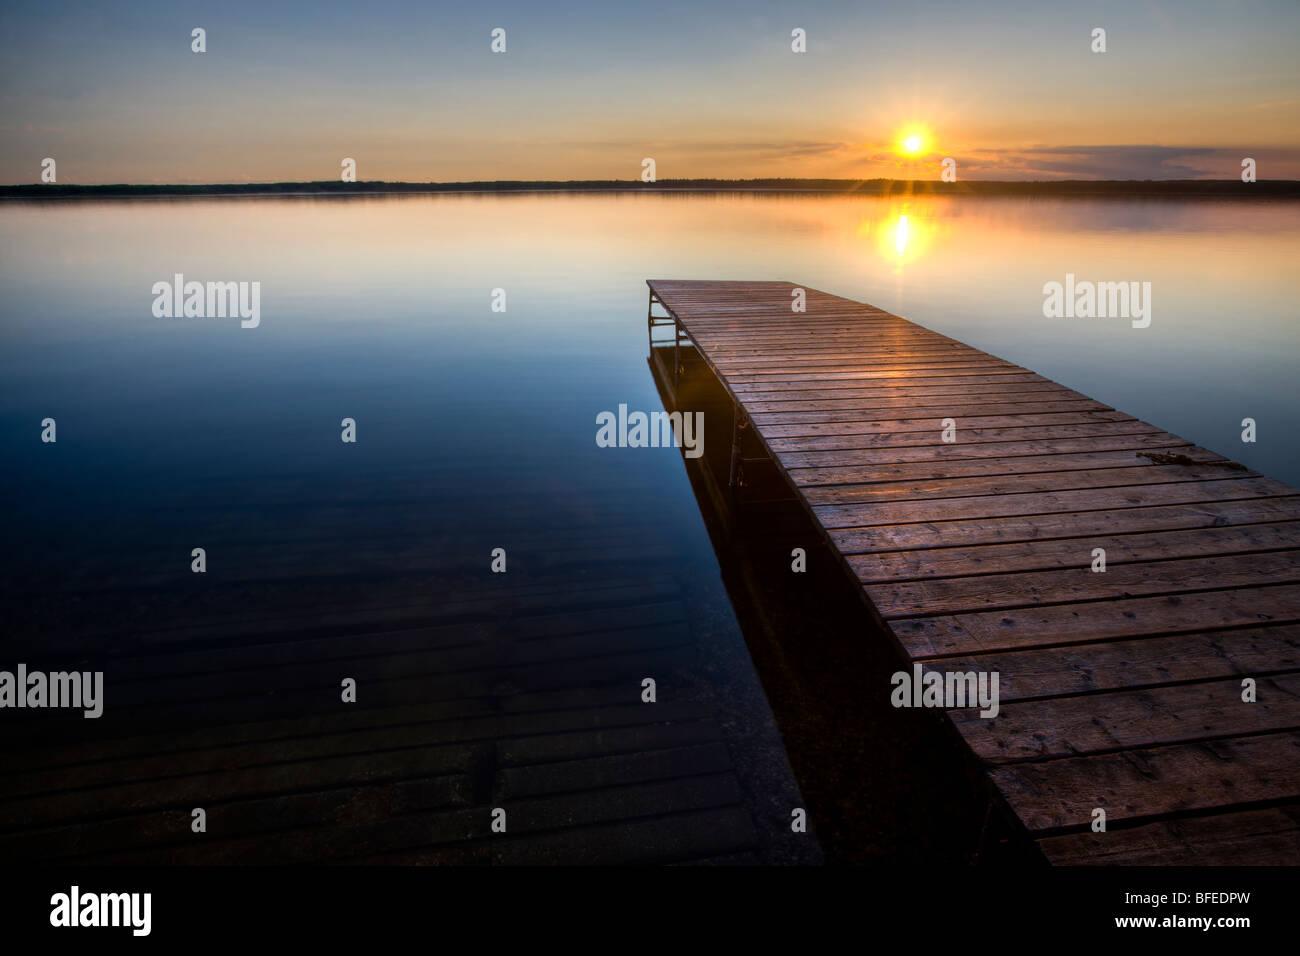 Sonnenuntergang über einem hölzernen Kai am Lake Audy, Riding Mountain National Park, Manitoba, Kanada Stockbild